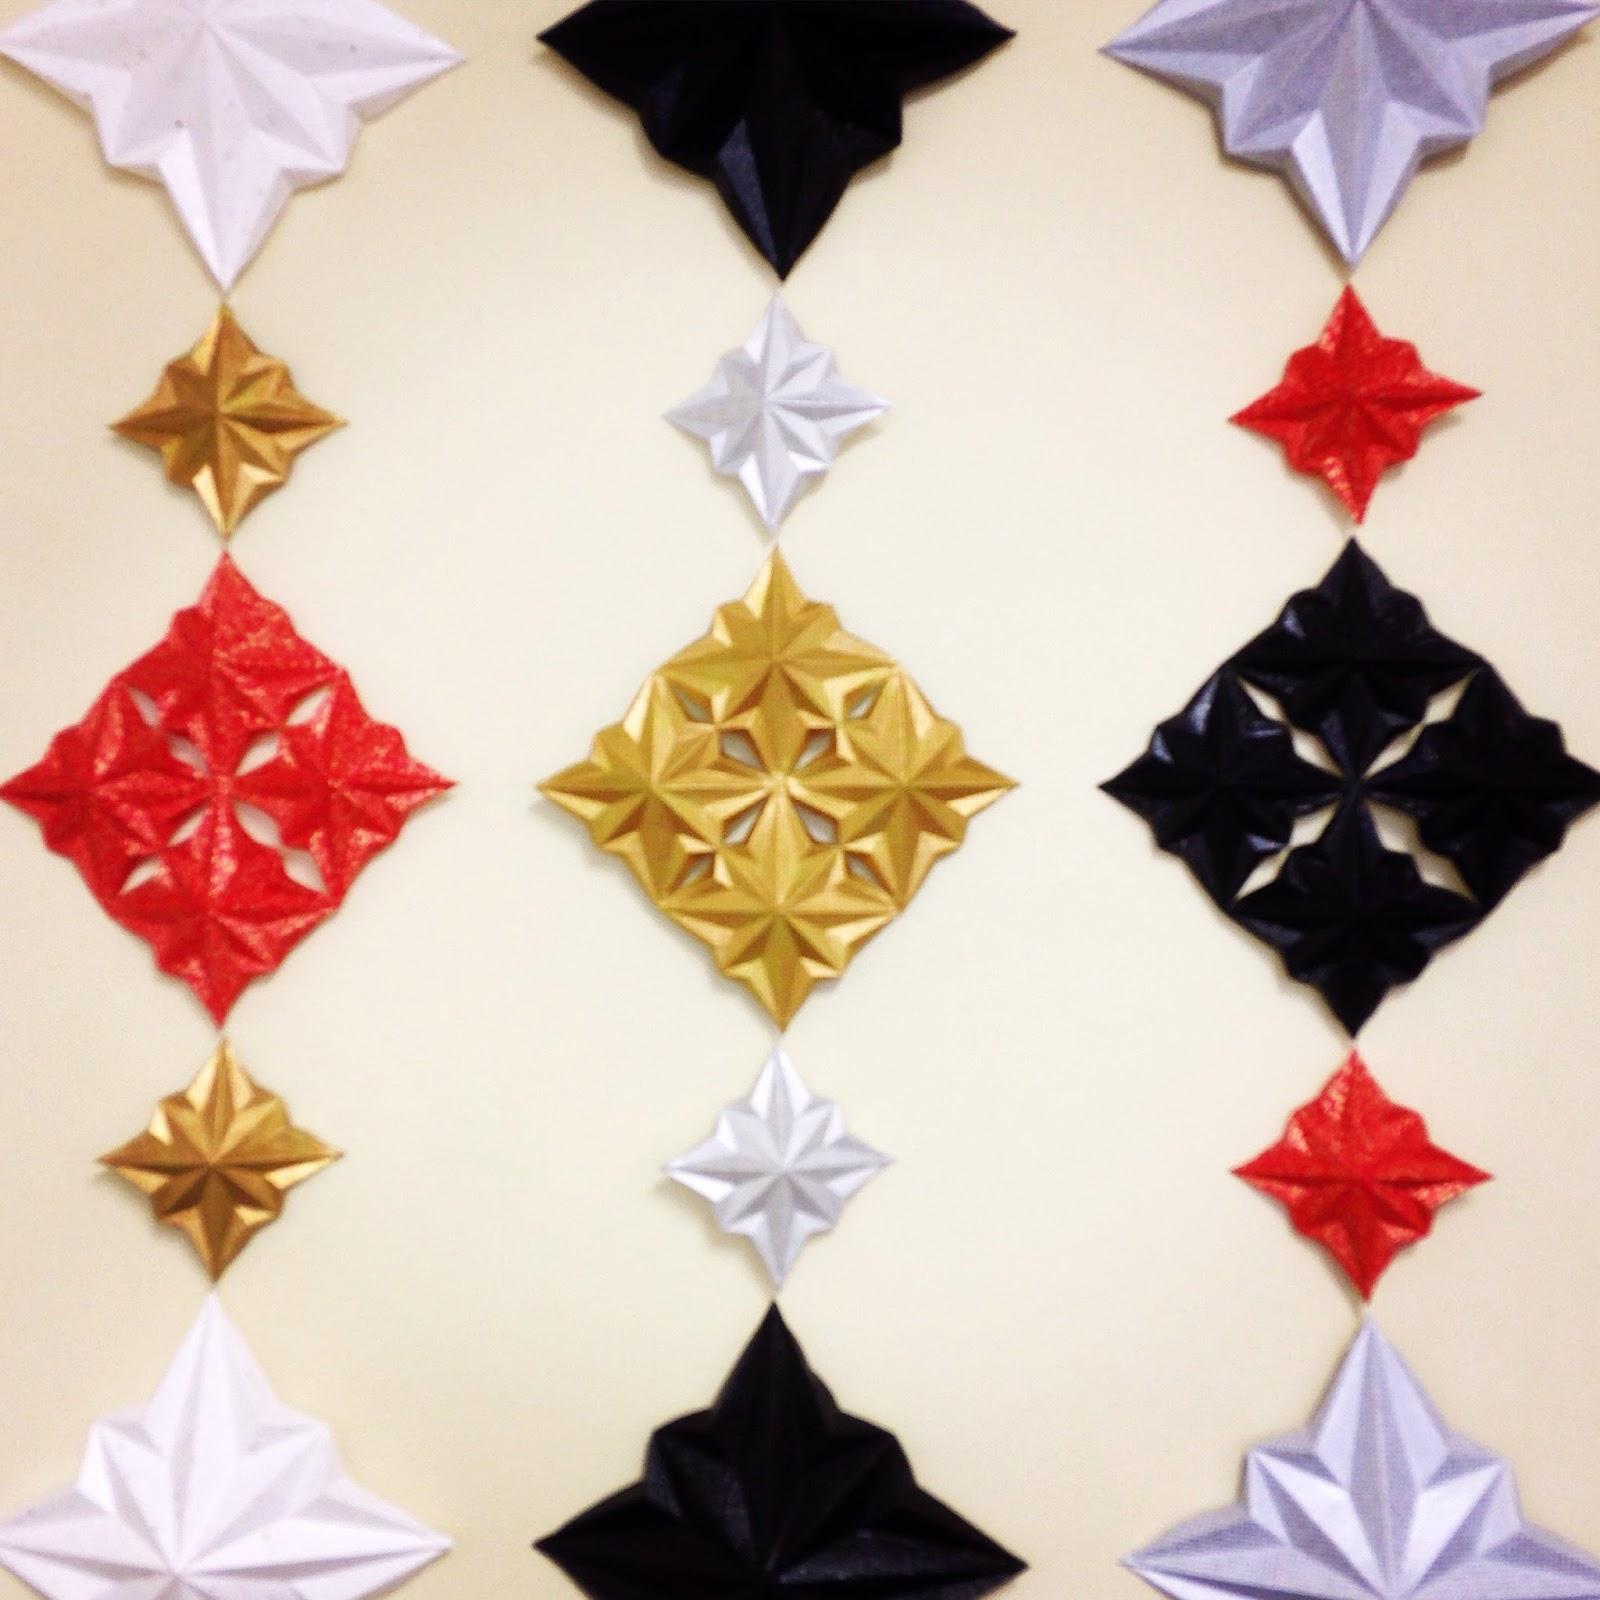 d co murale en origami kami art cr ation en papier. Black Bedroom Furniture Sets. Home Design Ideas